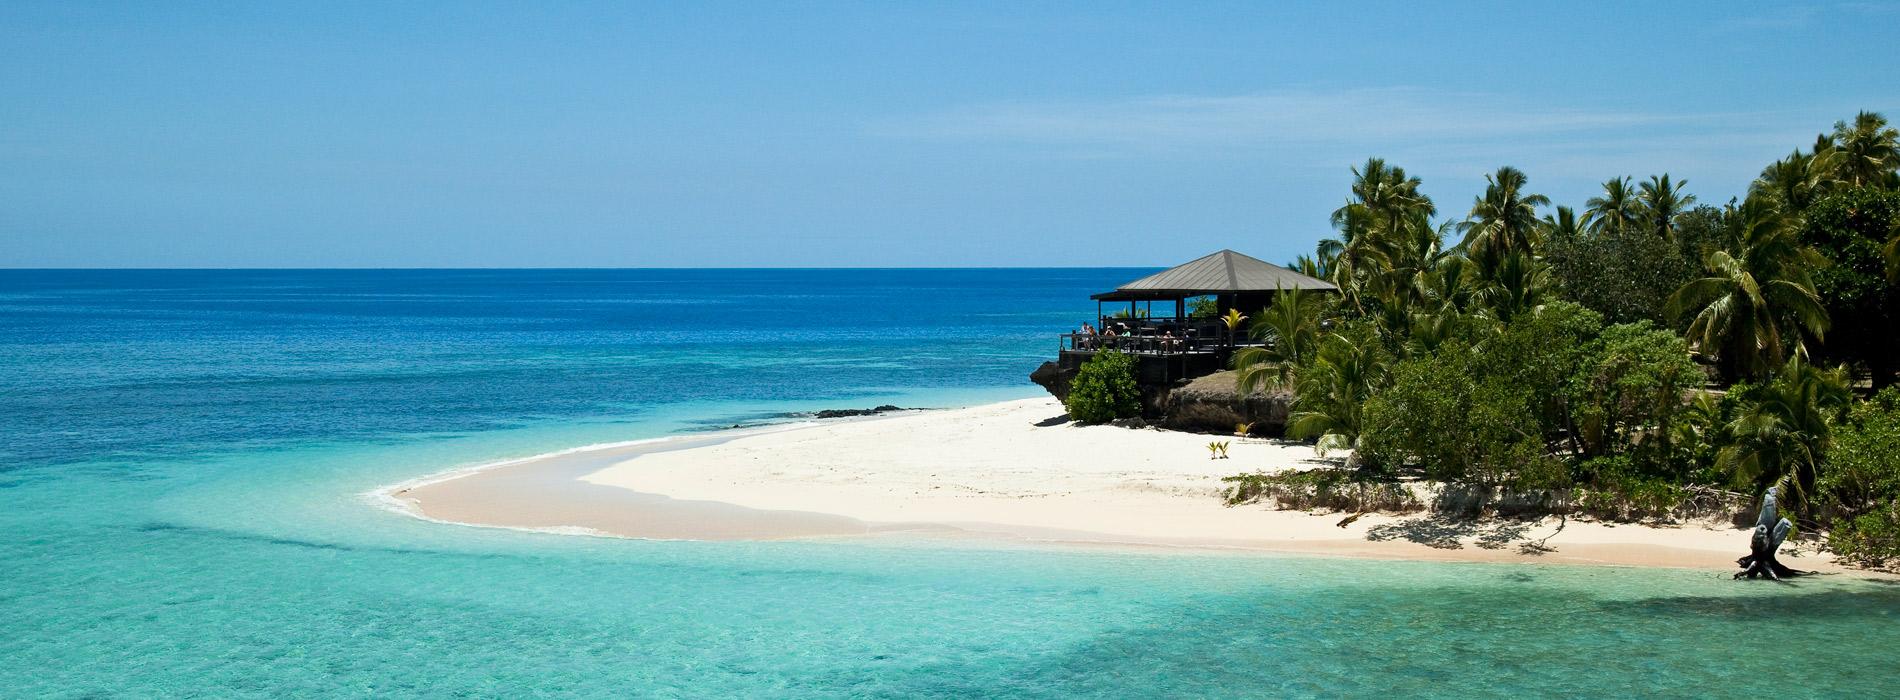 vomo island resort fiji travel review